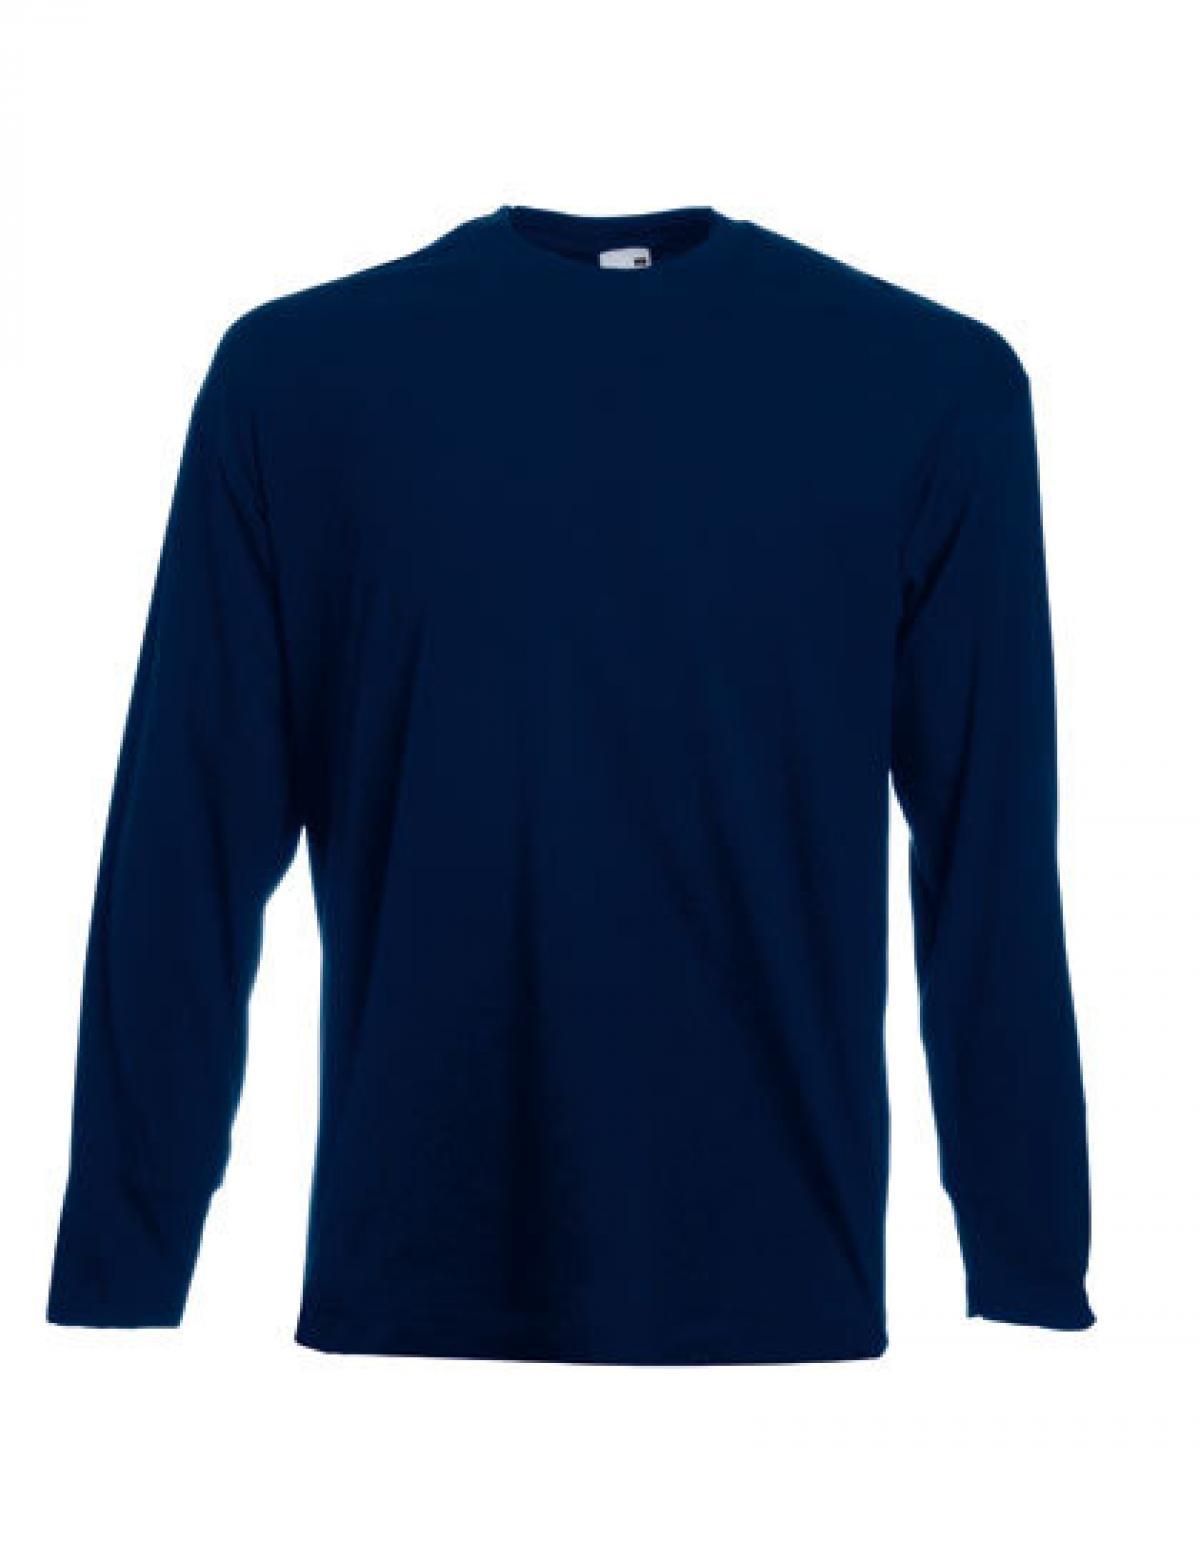 valueweight long sleeve herren t shirt rexlander s. Black Bedroom Furniture Sets. Home Design Ideas